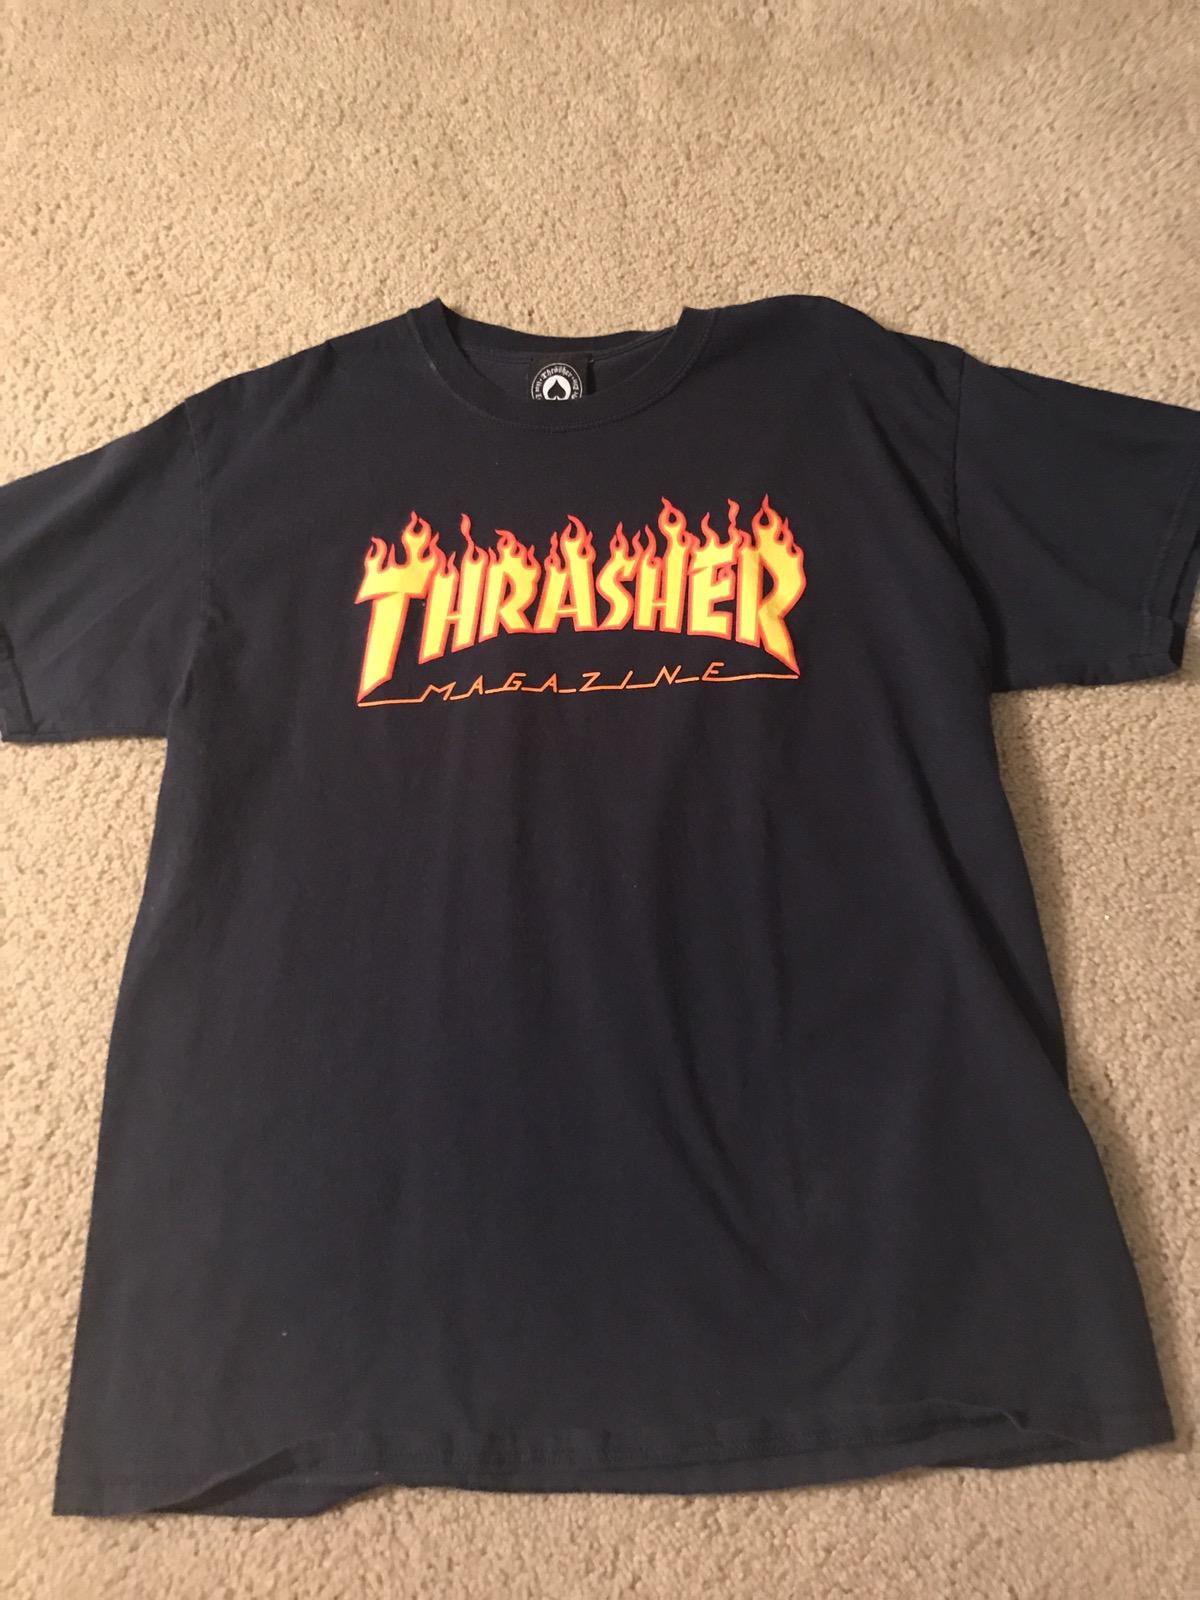 486fbf3e67b9 Thrasher thrasher t shirt navy blue Size l - Short Sleeve T-Shirts ...